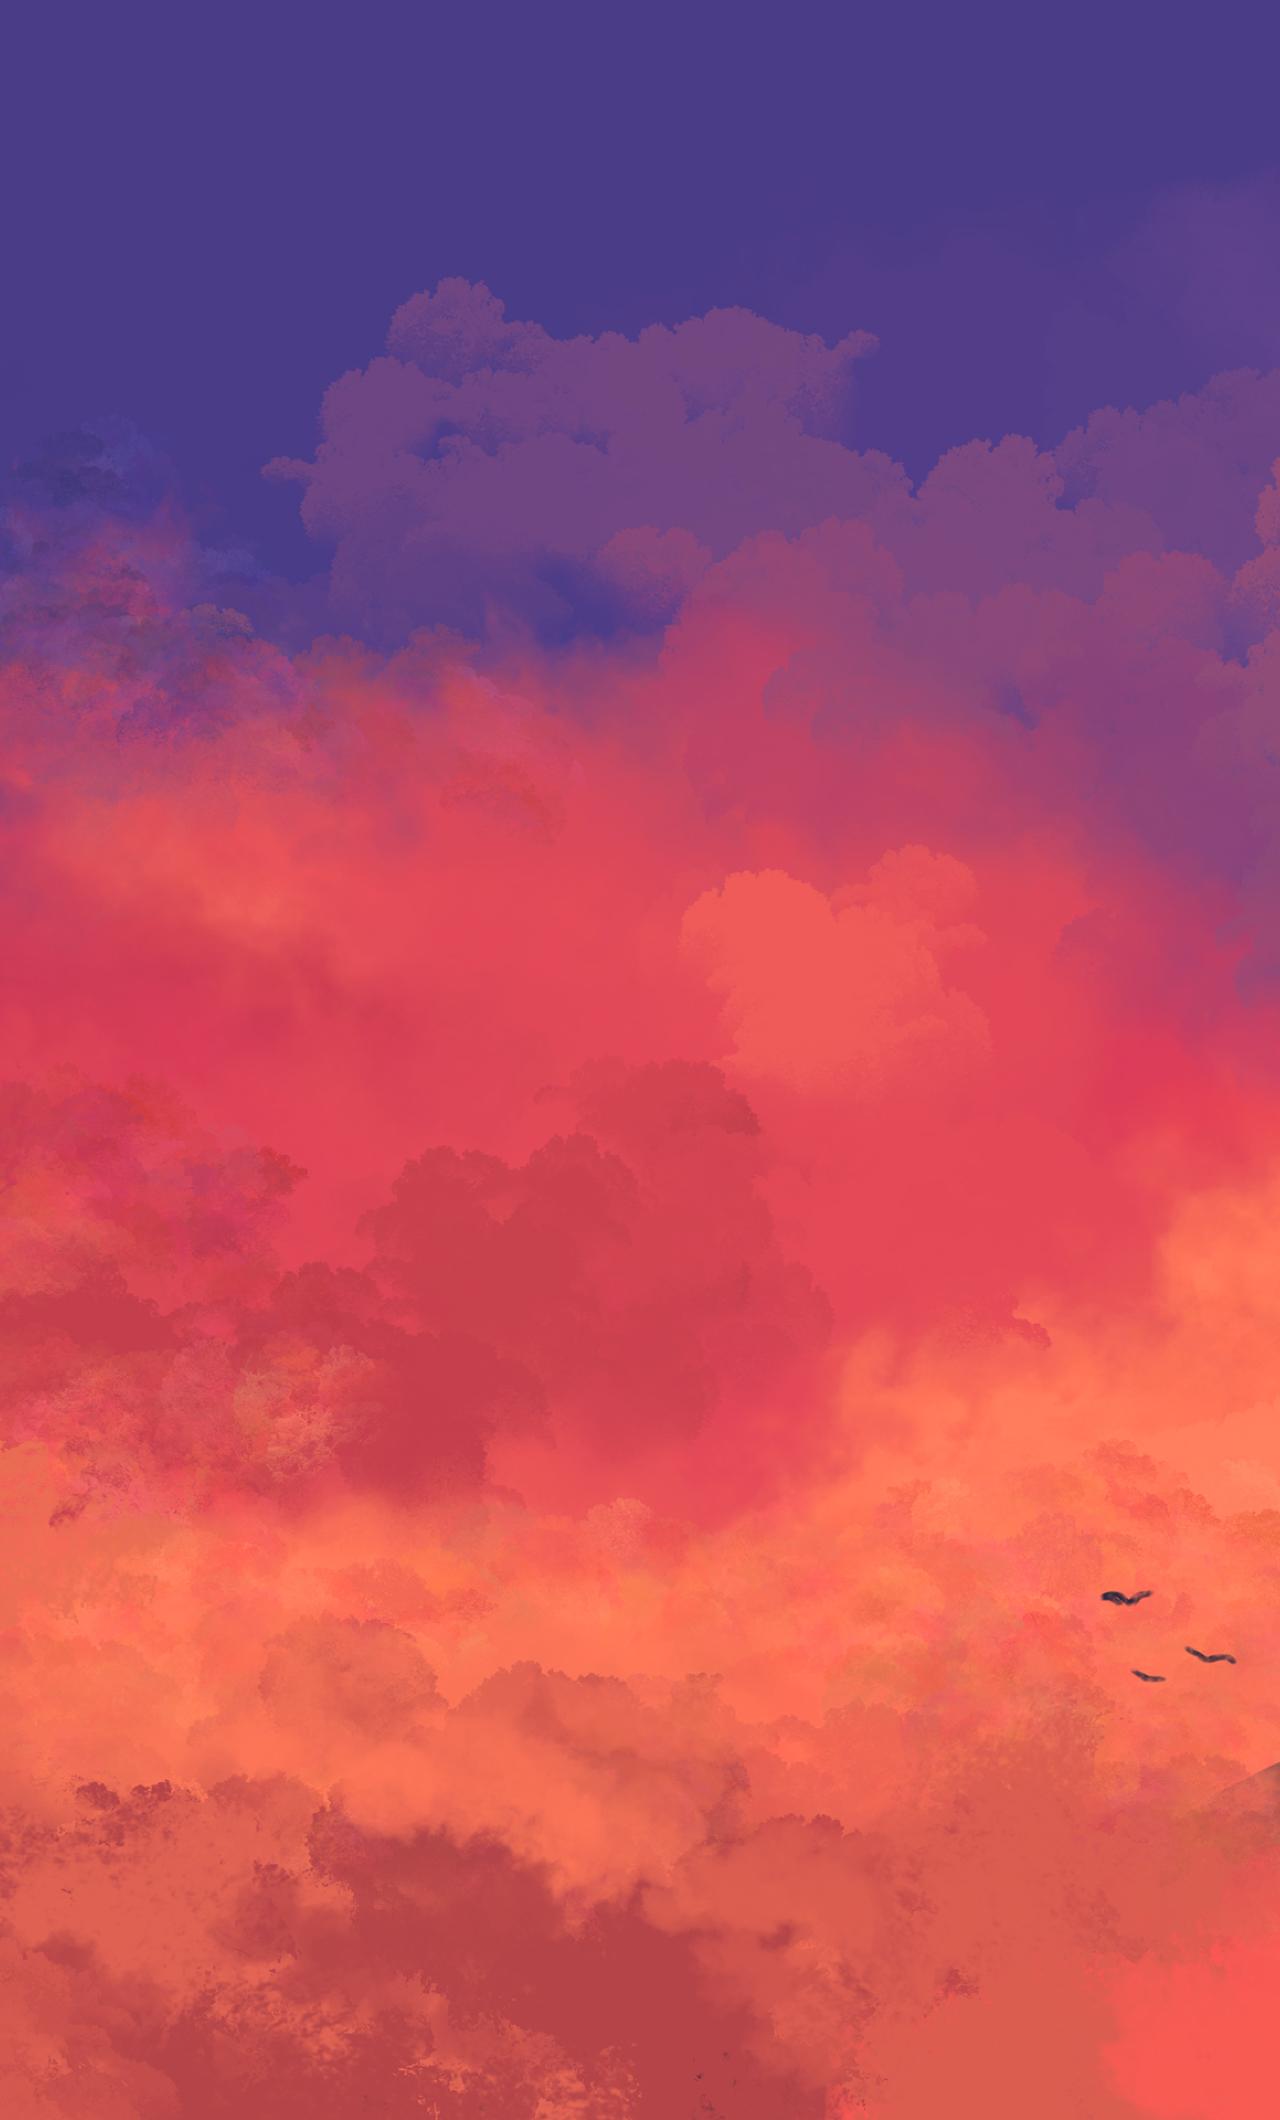 Simplistic Anime Wallpaper : simplistic, anime, wallpaper, Wallpaper, Anime, Iphone, Sachi